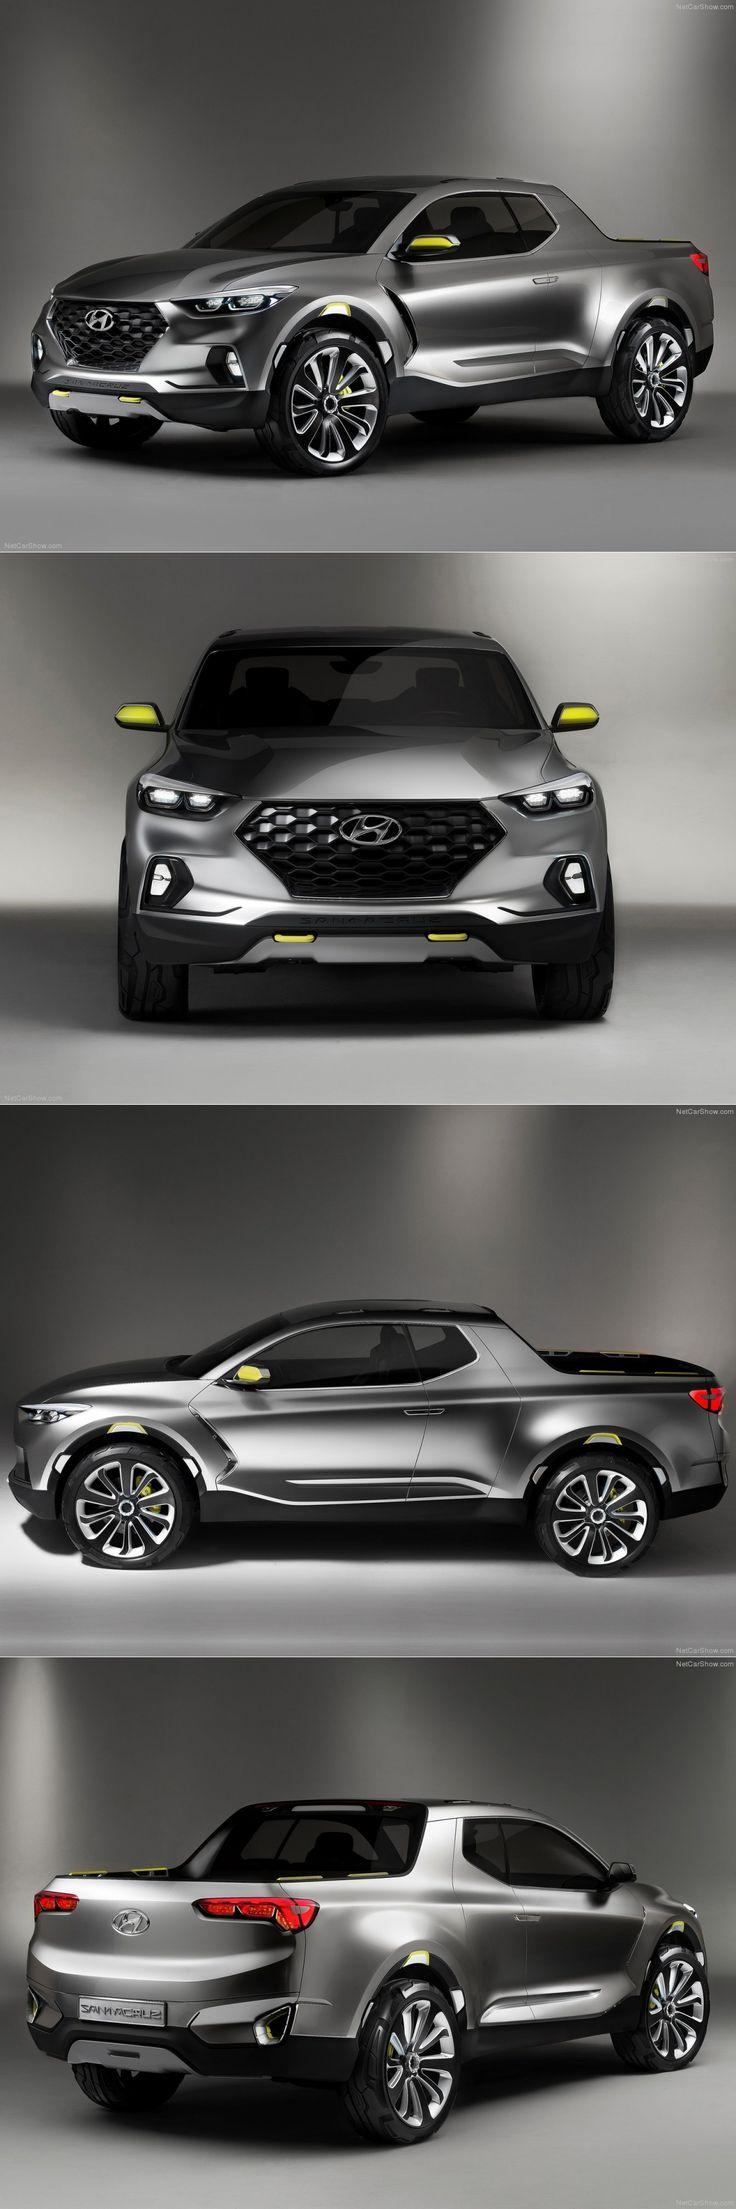 Hyundai Santa Cruz Pickup Truck, Detroit Auto Show, 2015